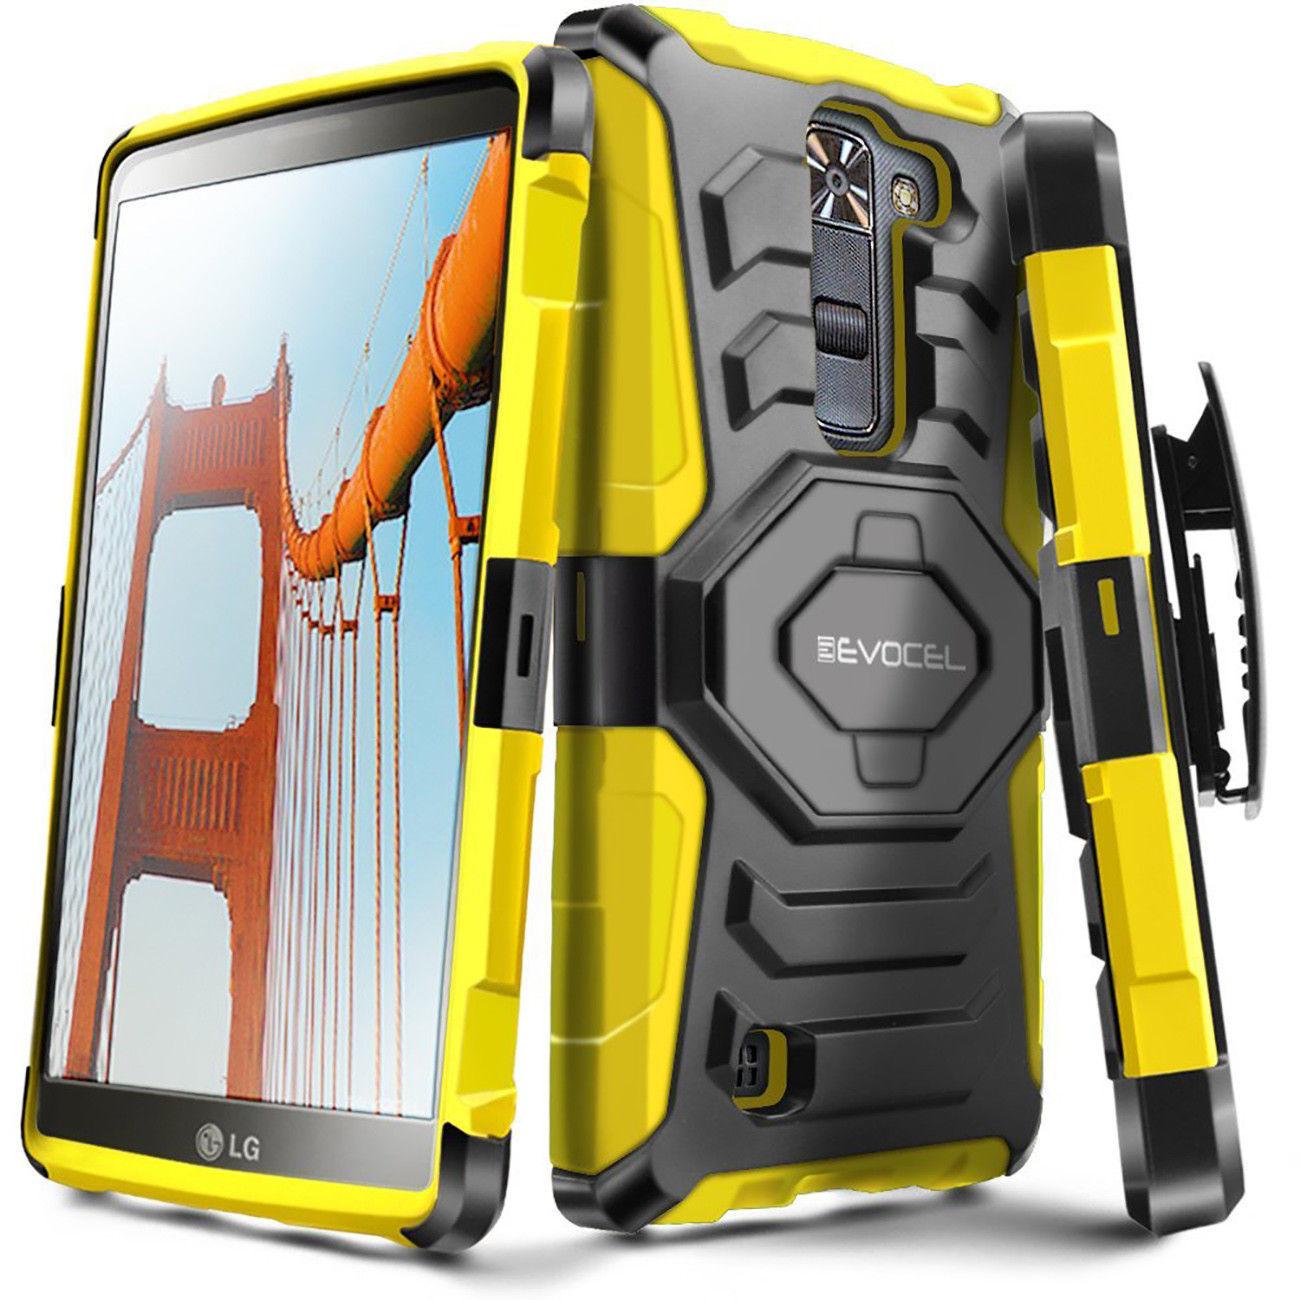 For LG K7 2016 / LG Tribute 5 Hard Shockproof Case Cover Clip Holster Kickstand